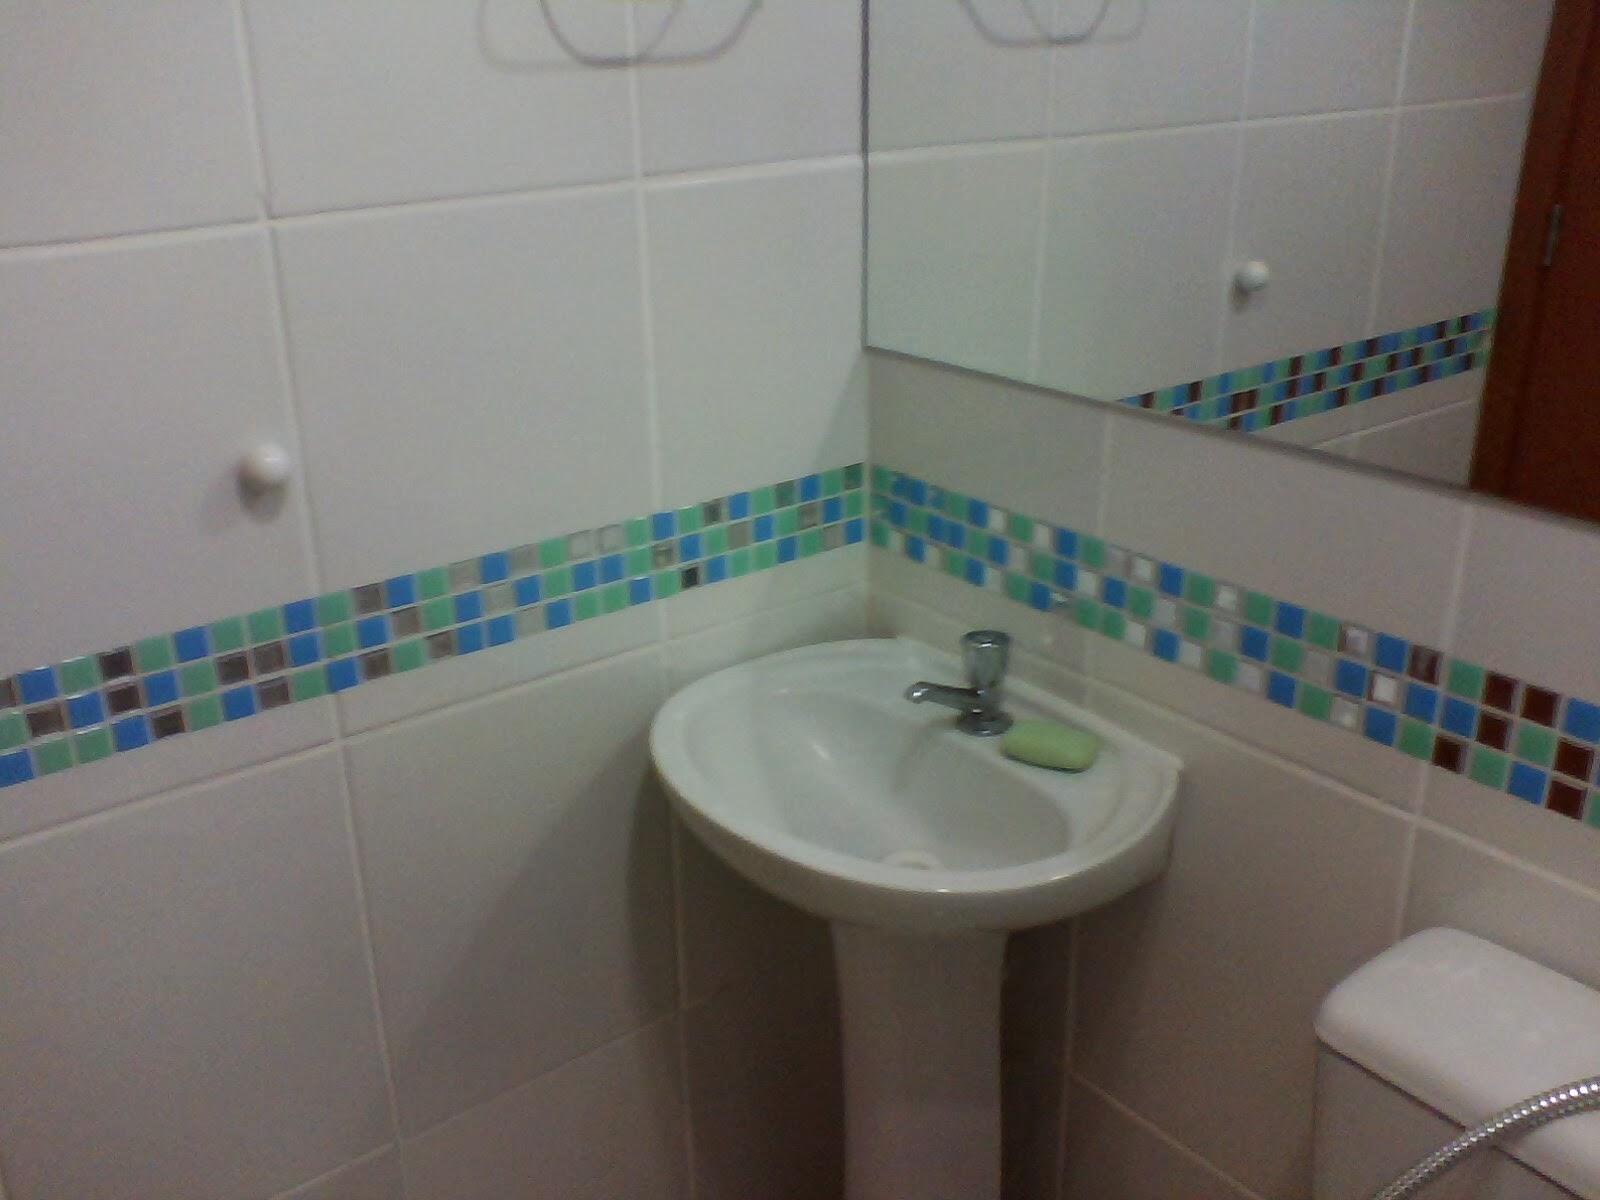 Cafofo Sonhado: As tais pastilhas resinadas adesivas #284969 1600x1200 Banheiro Com Pastilha Atras Do Vaso Sanitario